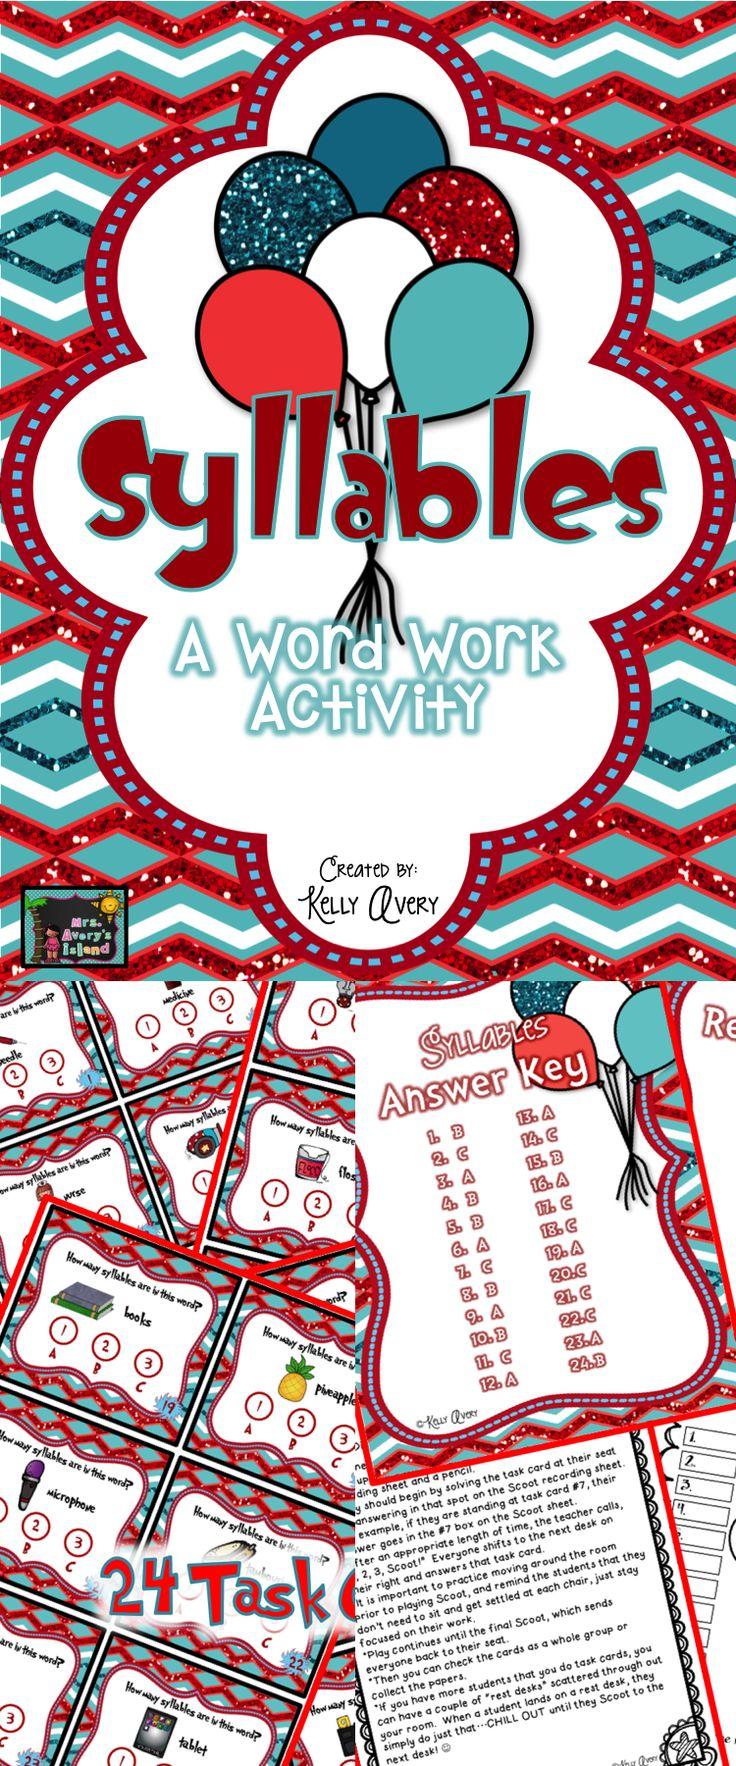 Syllable patterns vccv worksheet education com - Syllables Syllable Counting Daily 5 Work On Words Word Work Activities Teachersfollowteachers Teacherspayteachers